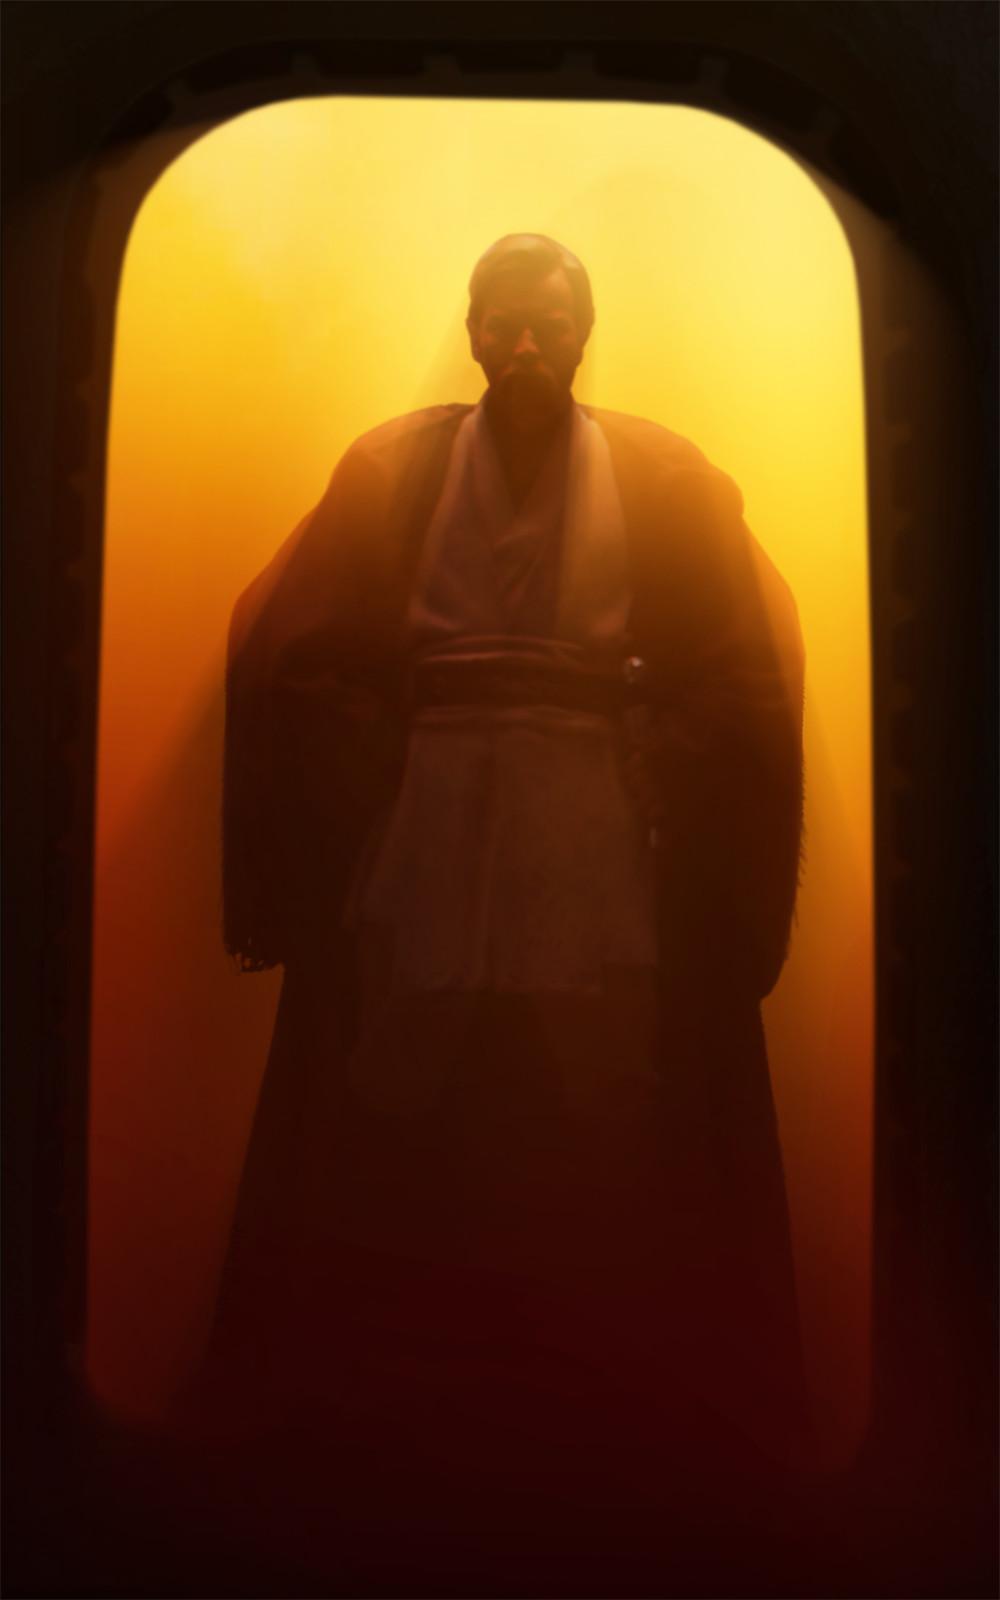 joel-moore-star-wars-exile-obi-wan-kenob